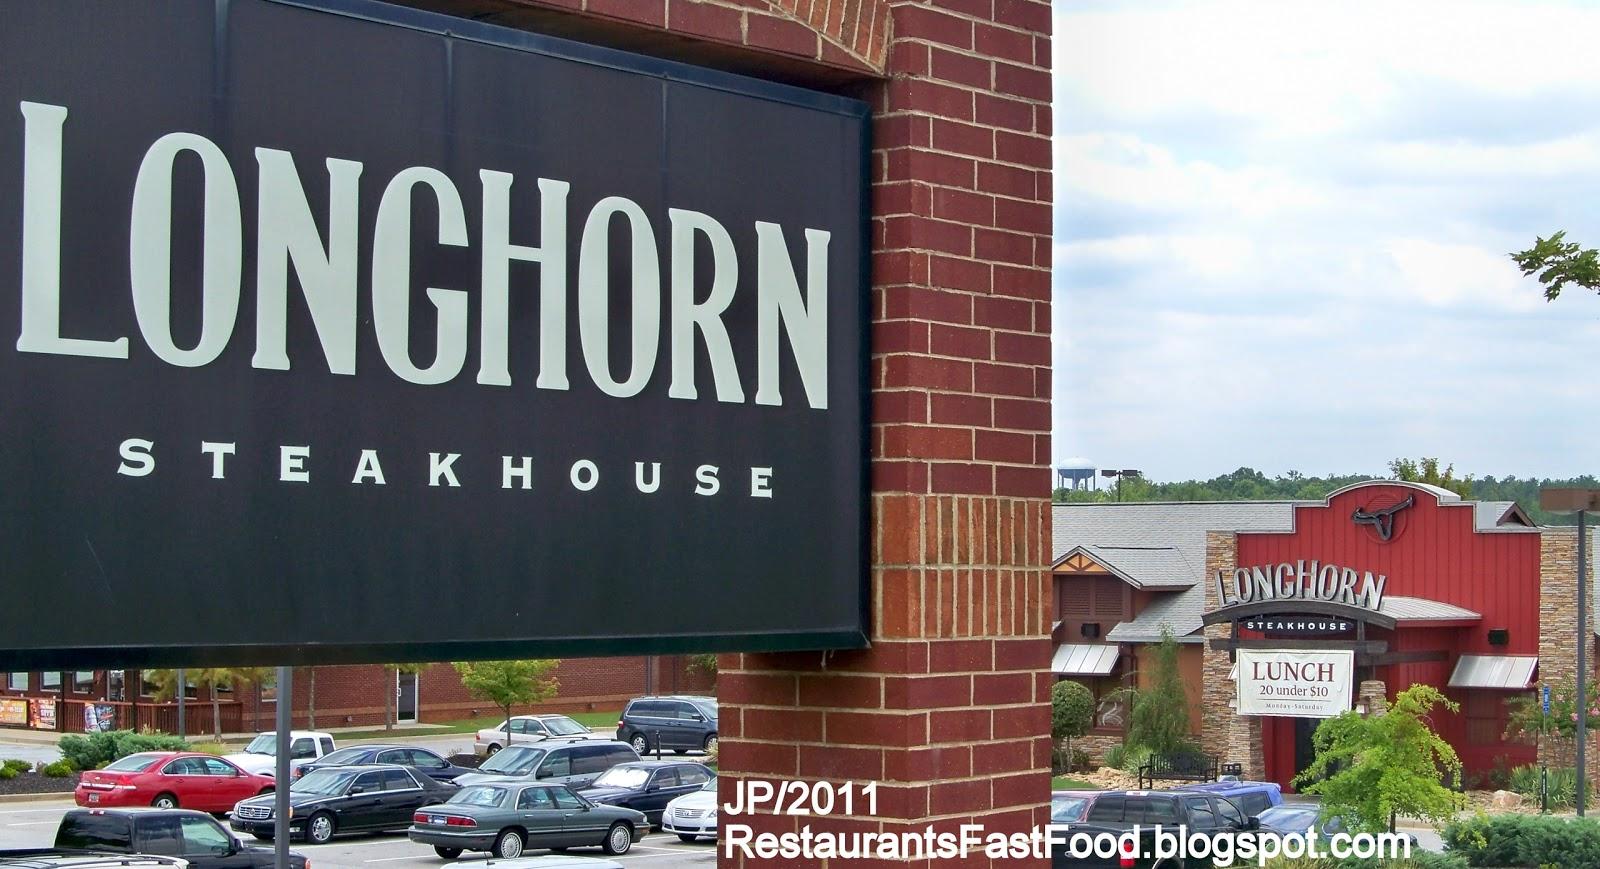 Longhorn Steakhouse Mc Donough Georgia Jonesboro Road Steak House Restaurant Henry County Mcdonough Ga